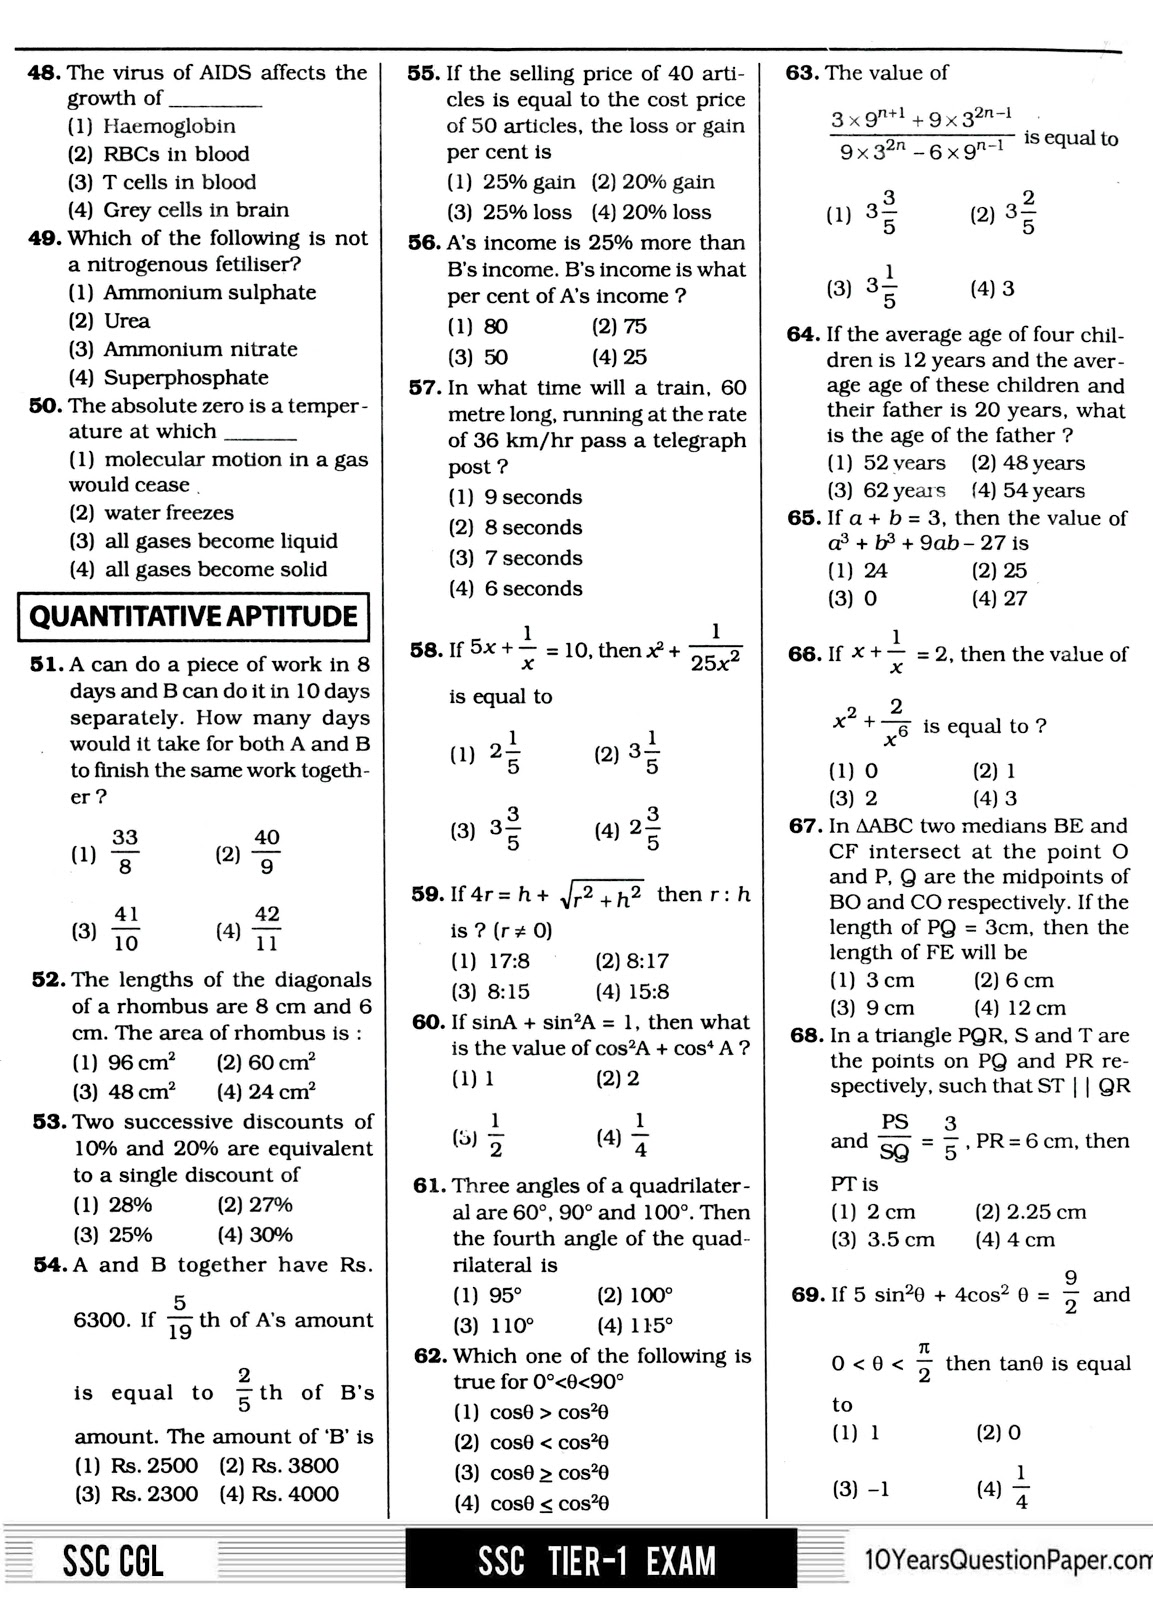 SSC 2017 CGL Question Paper